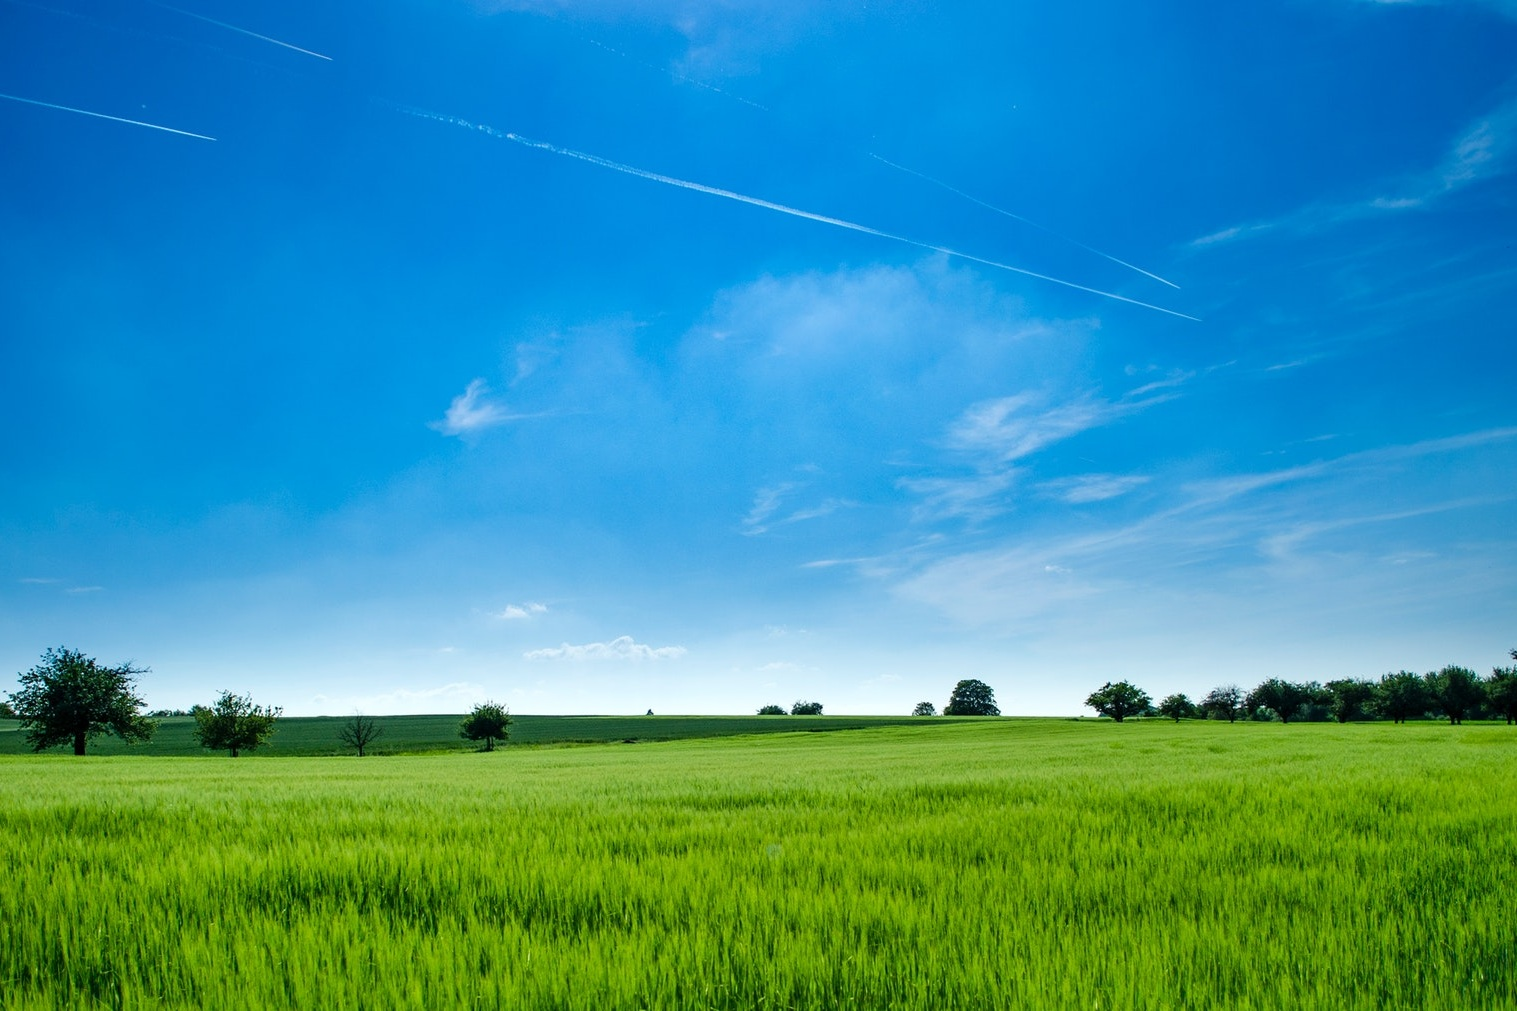 DiscoverEI Environmental Monitoring